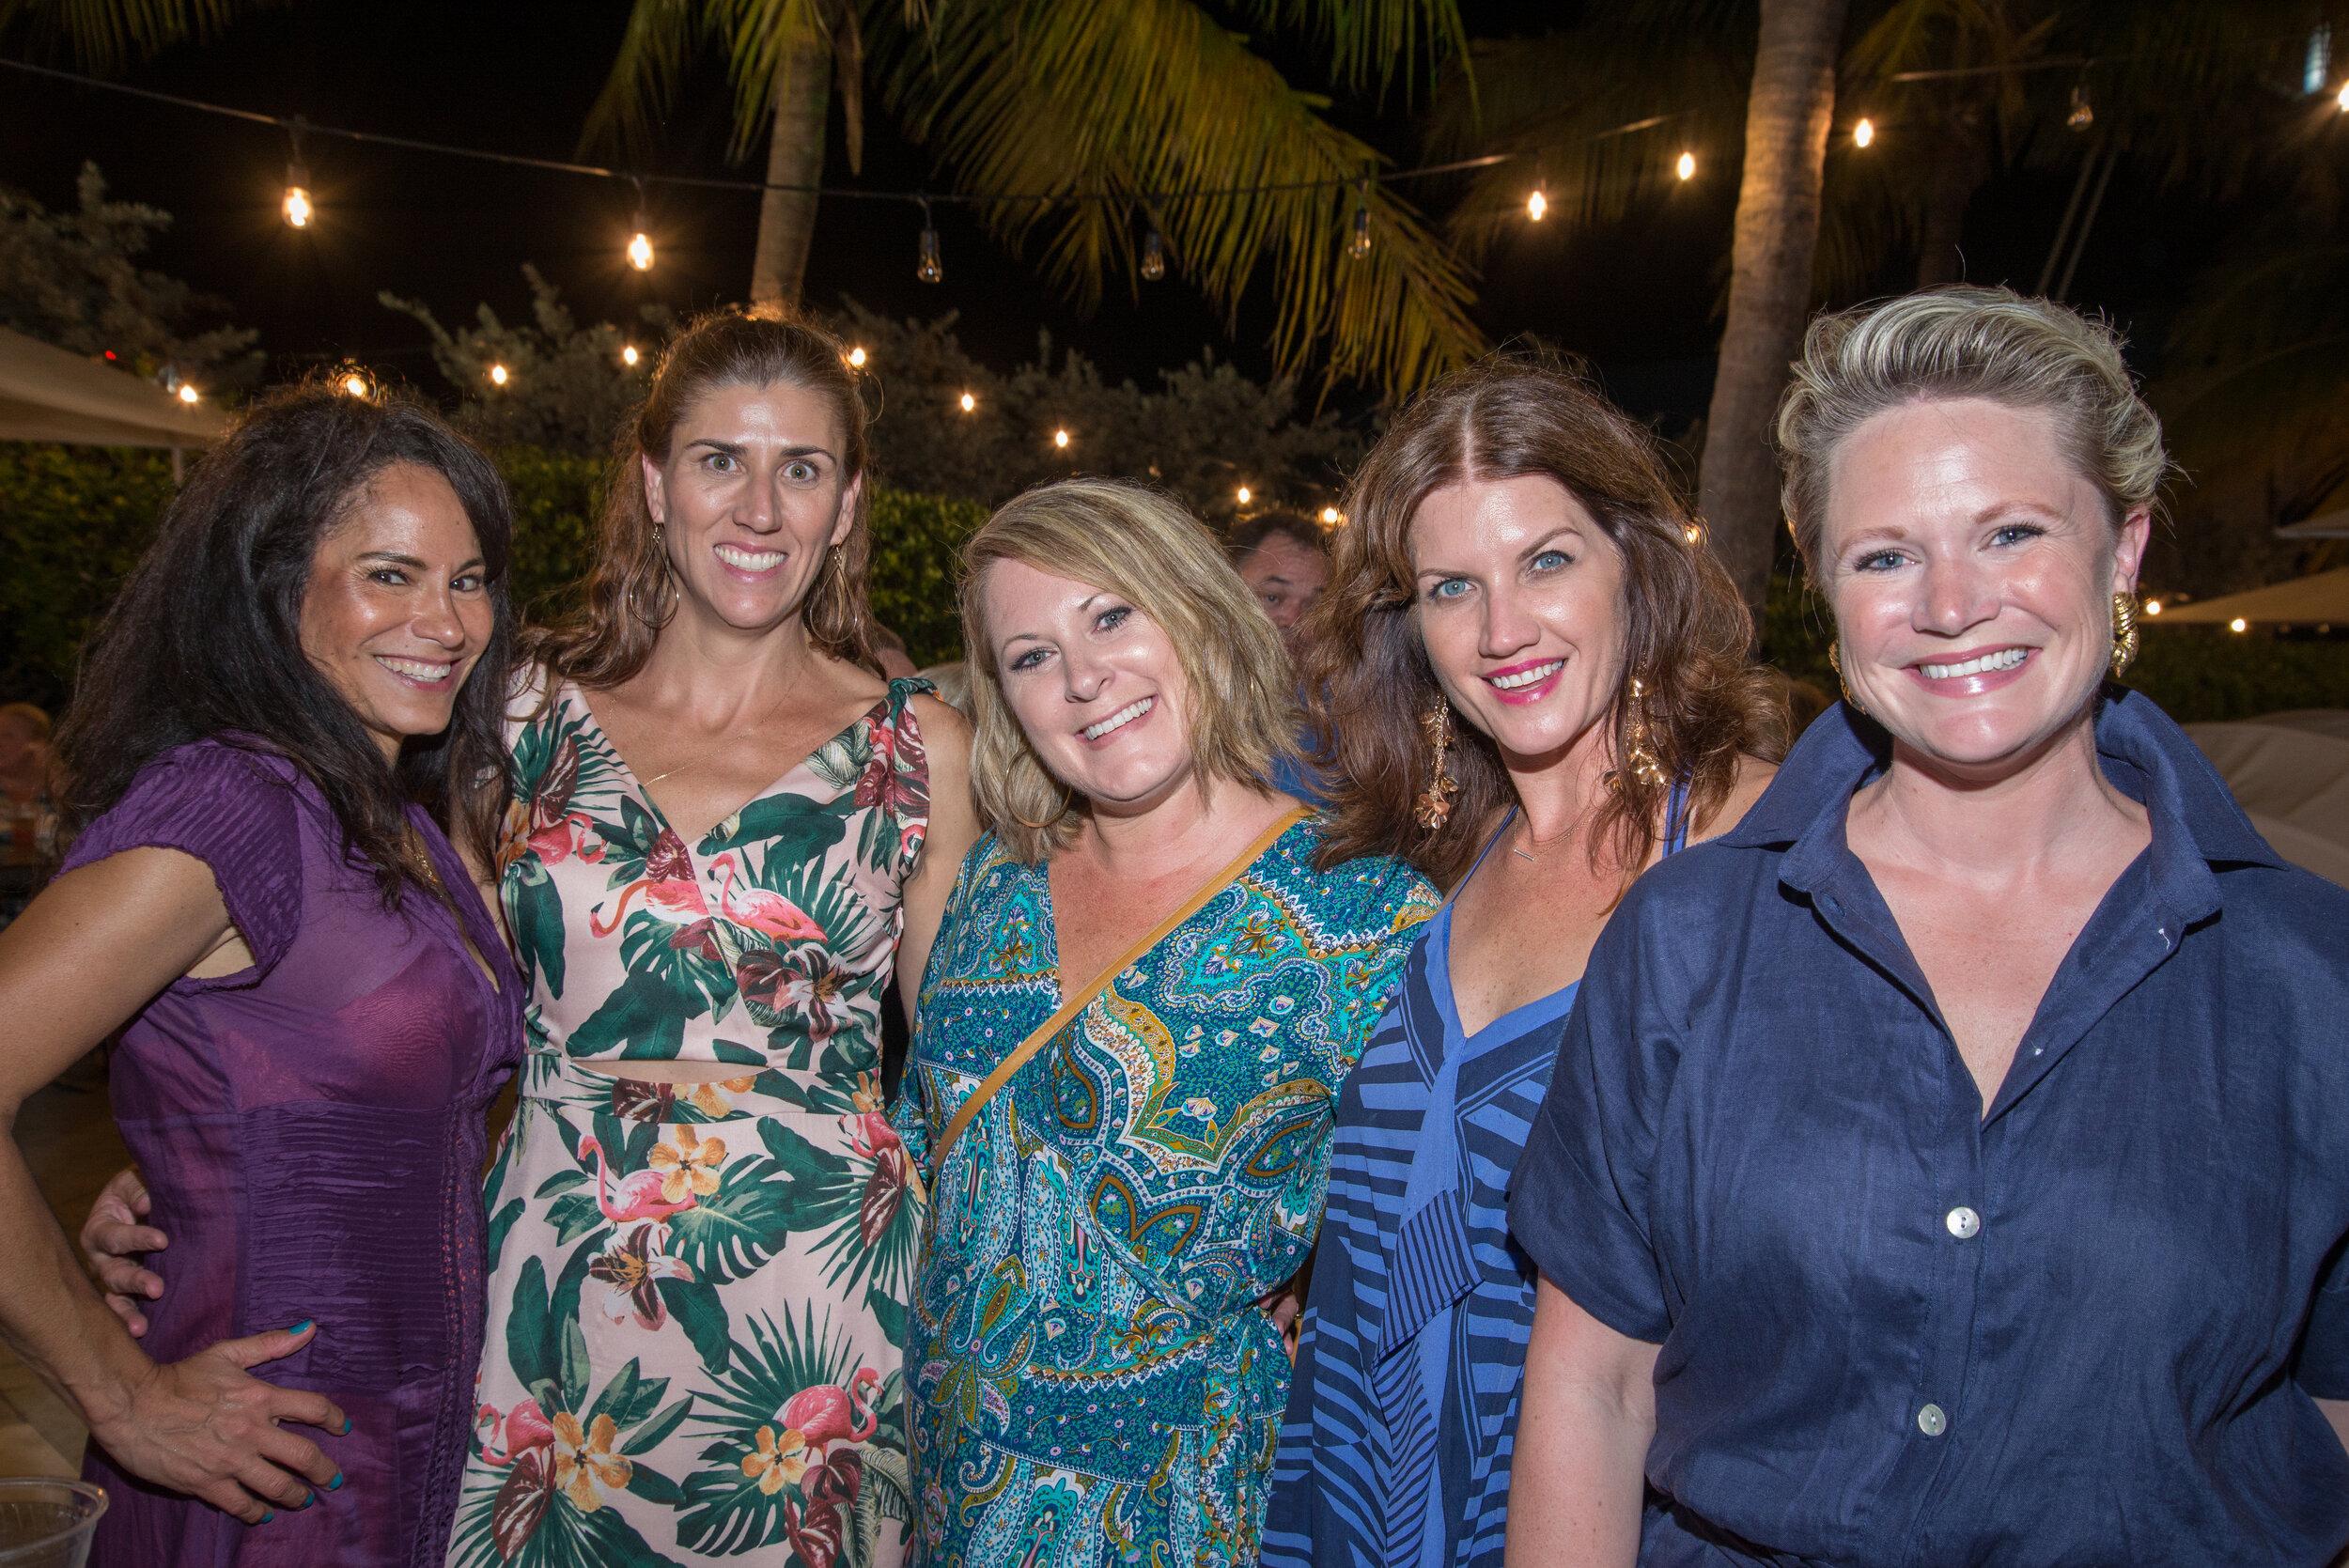 Veronica Knott, Laurie Lenz, Amanda Whelpley, Susan Mahoney, Kate Waterhouse.jpg